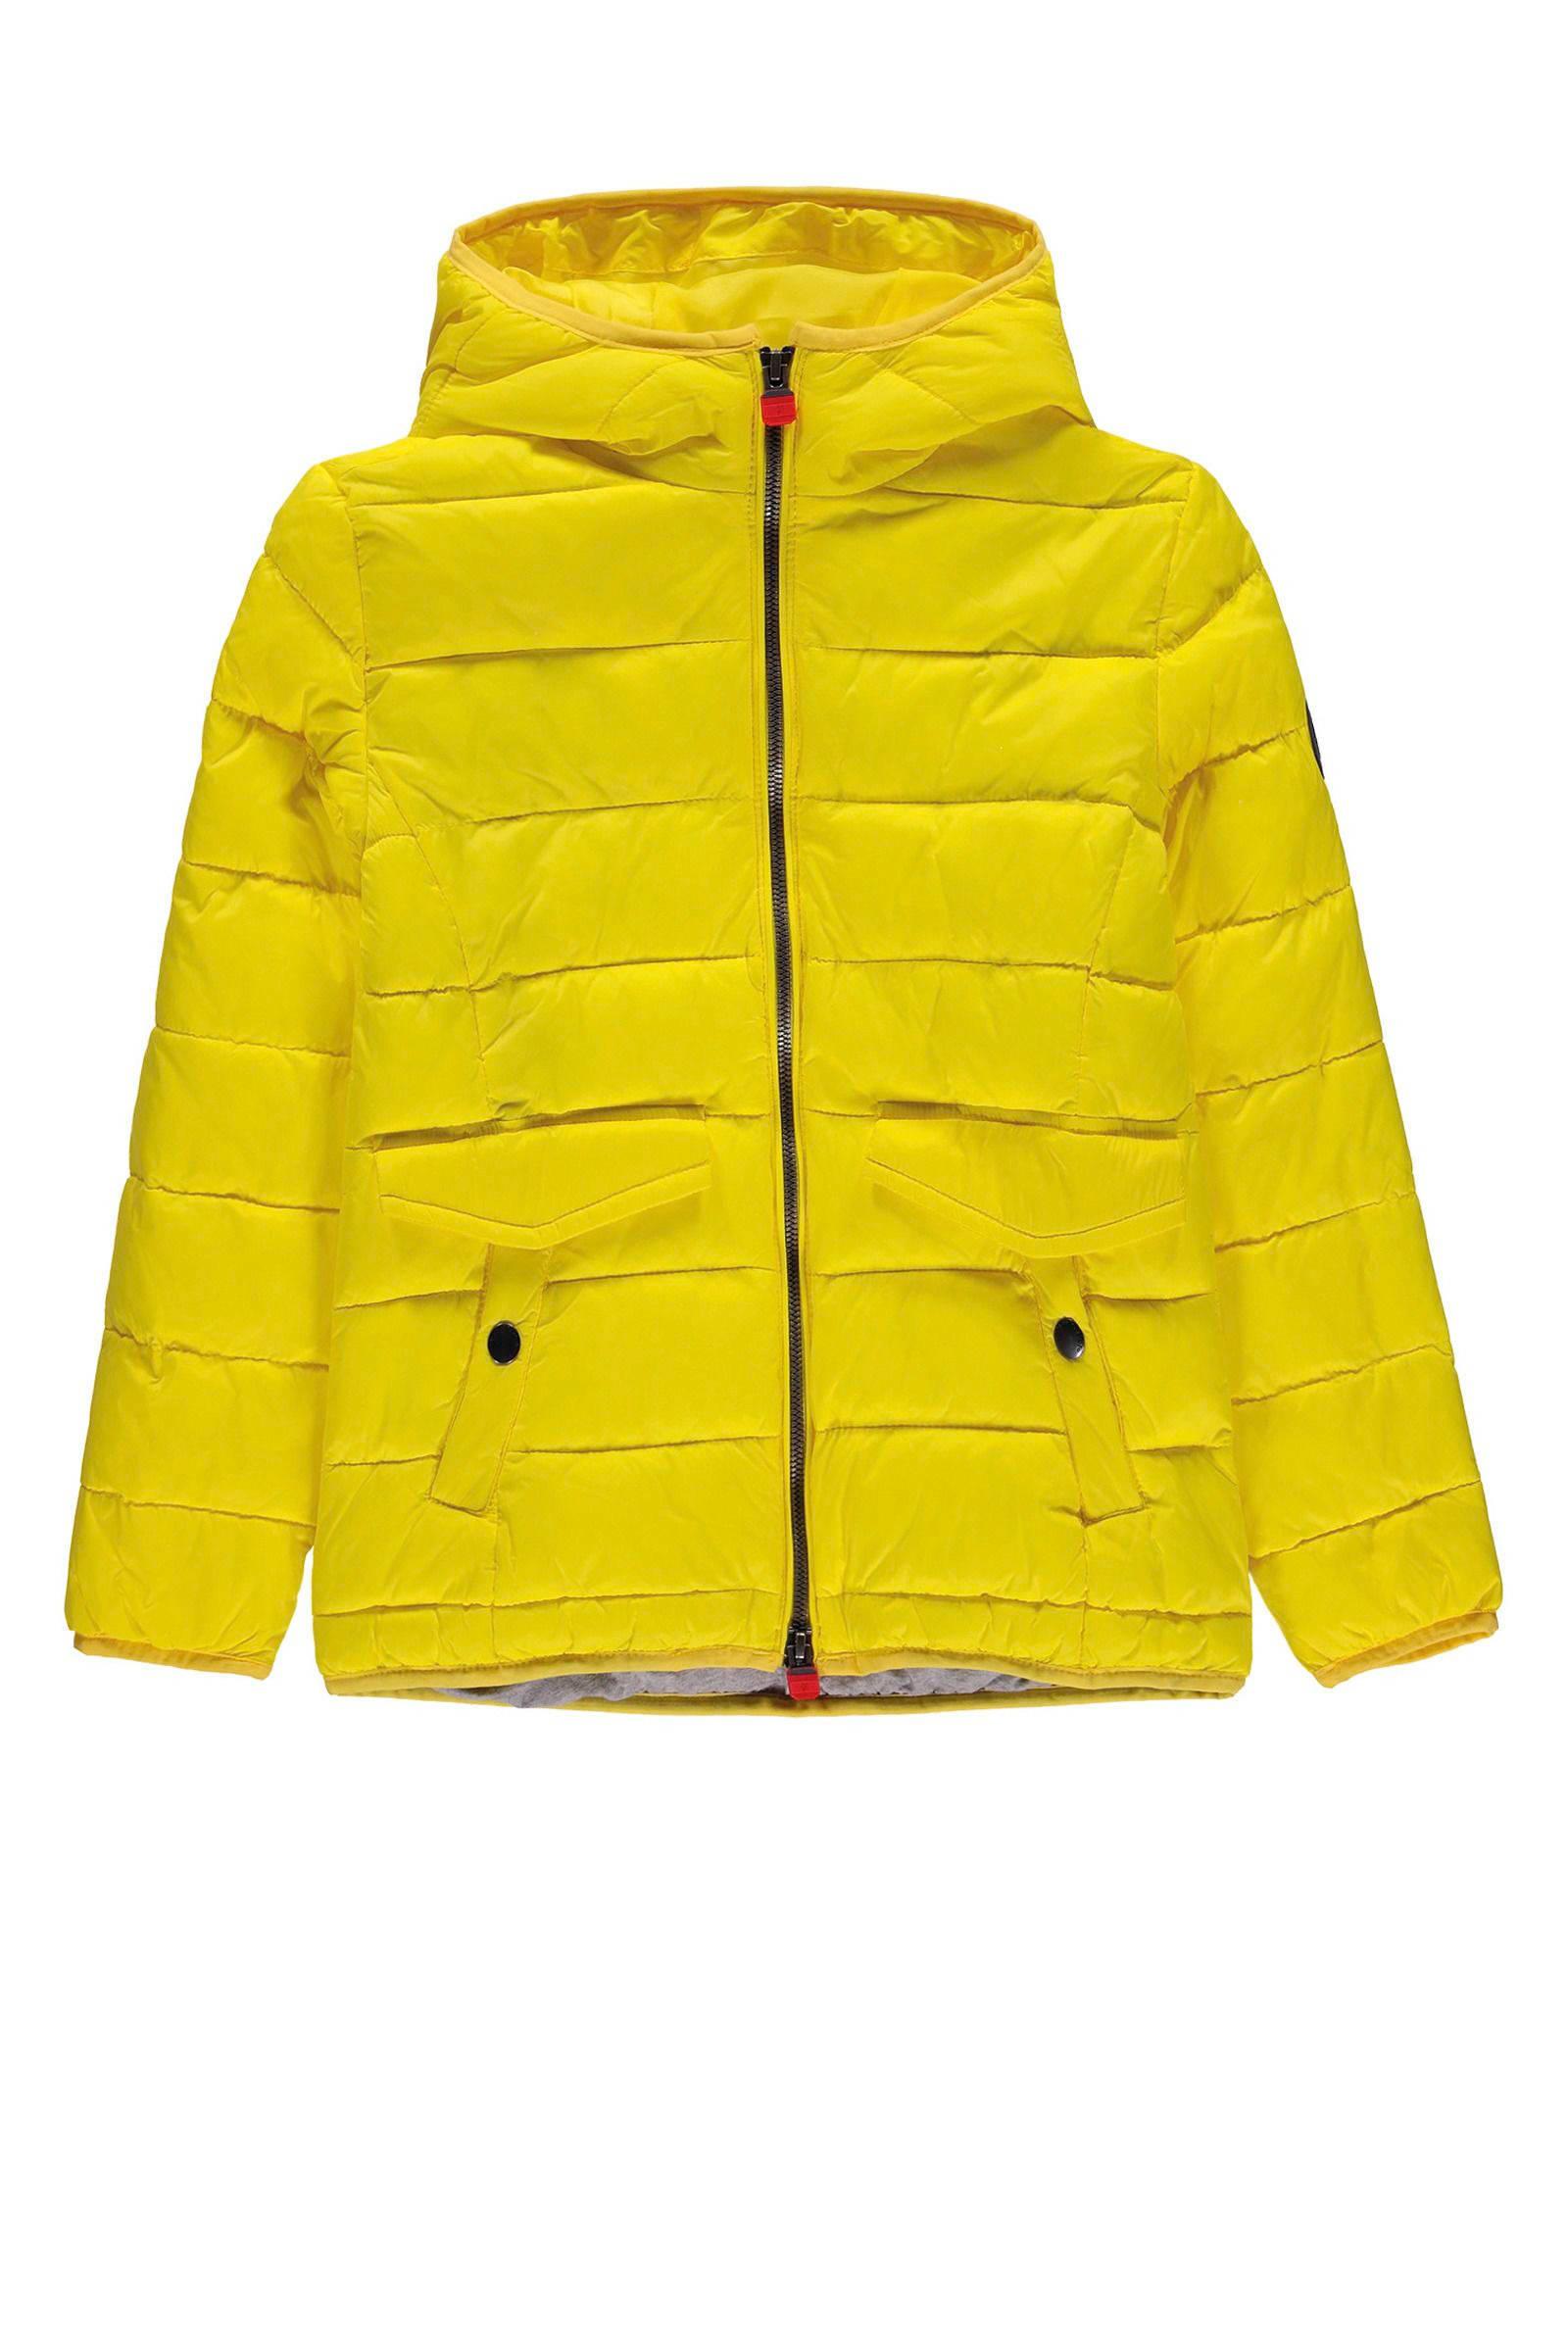 Marc O'Polo jas met stiksels geel